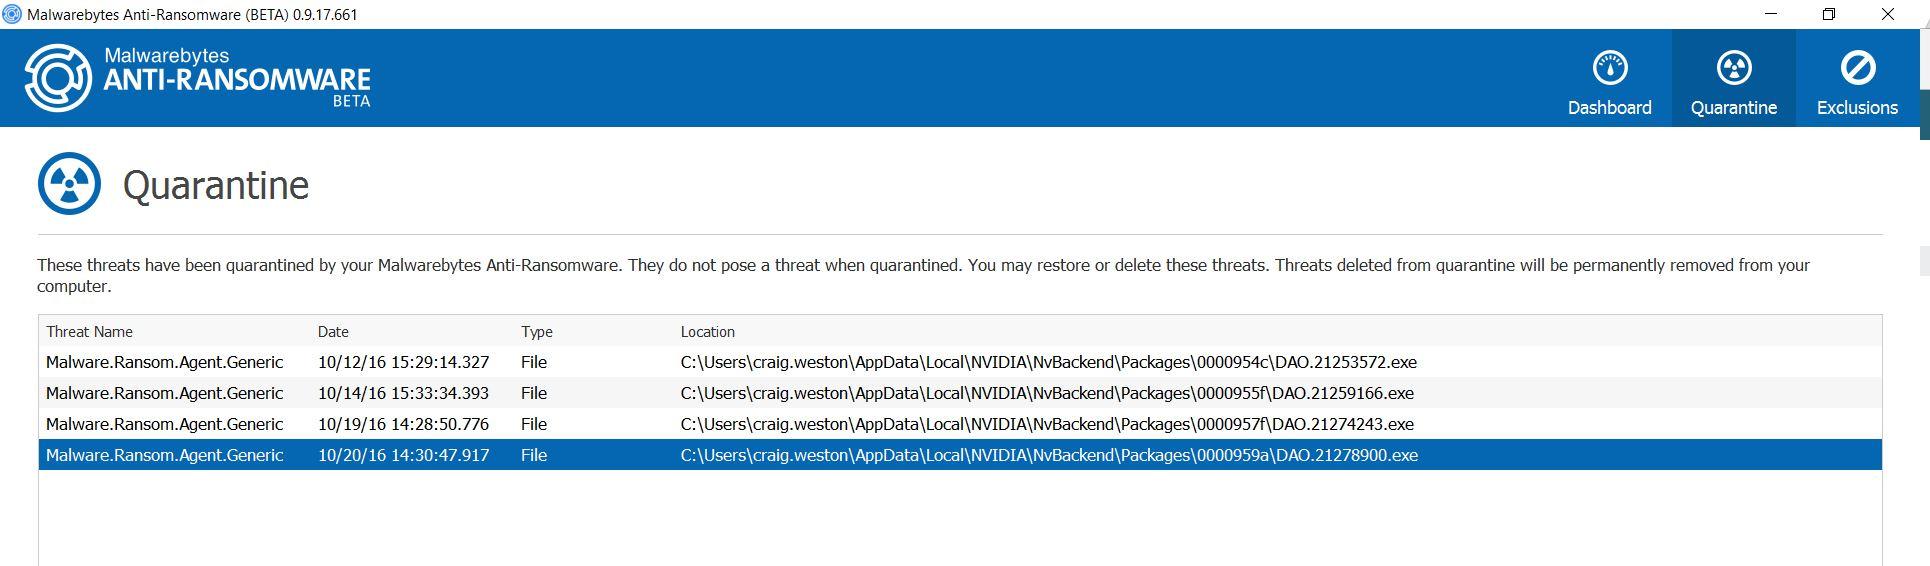 Nvidia Files false positivves - Anti-Ransomware Beta - Malwarebytes